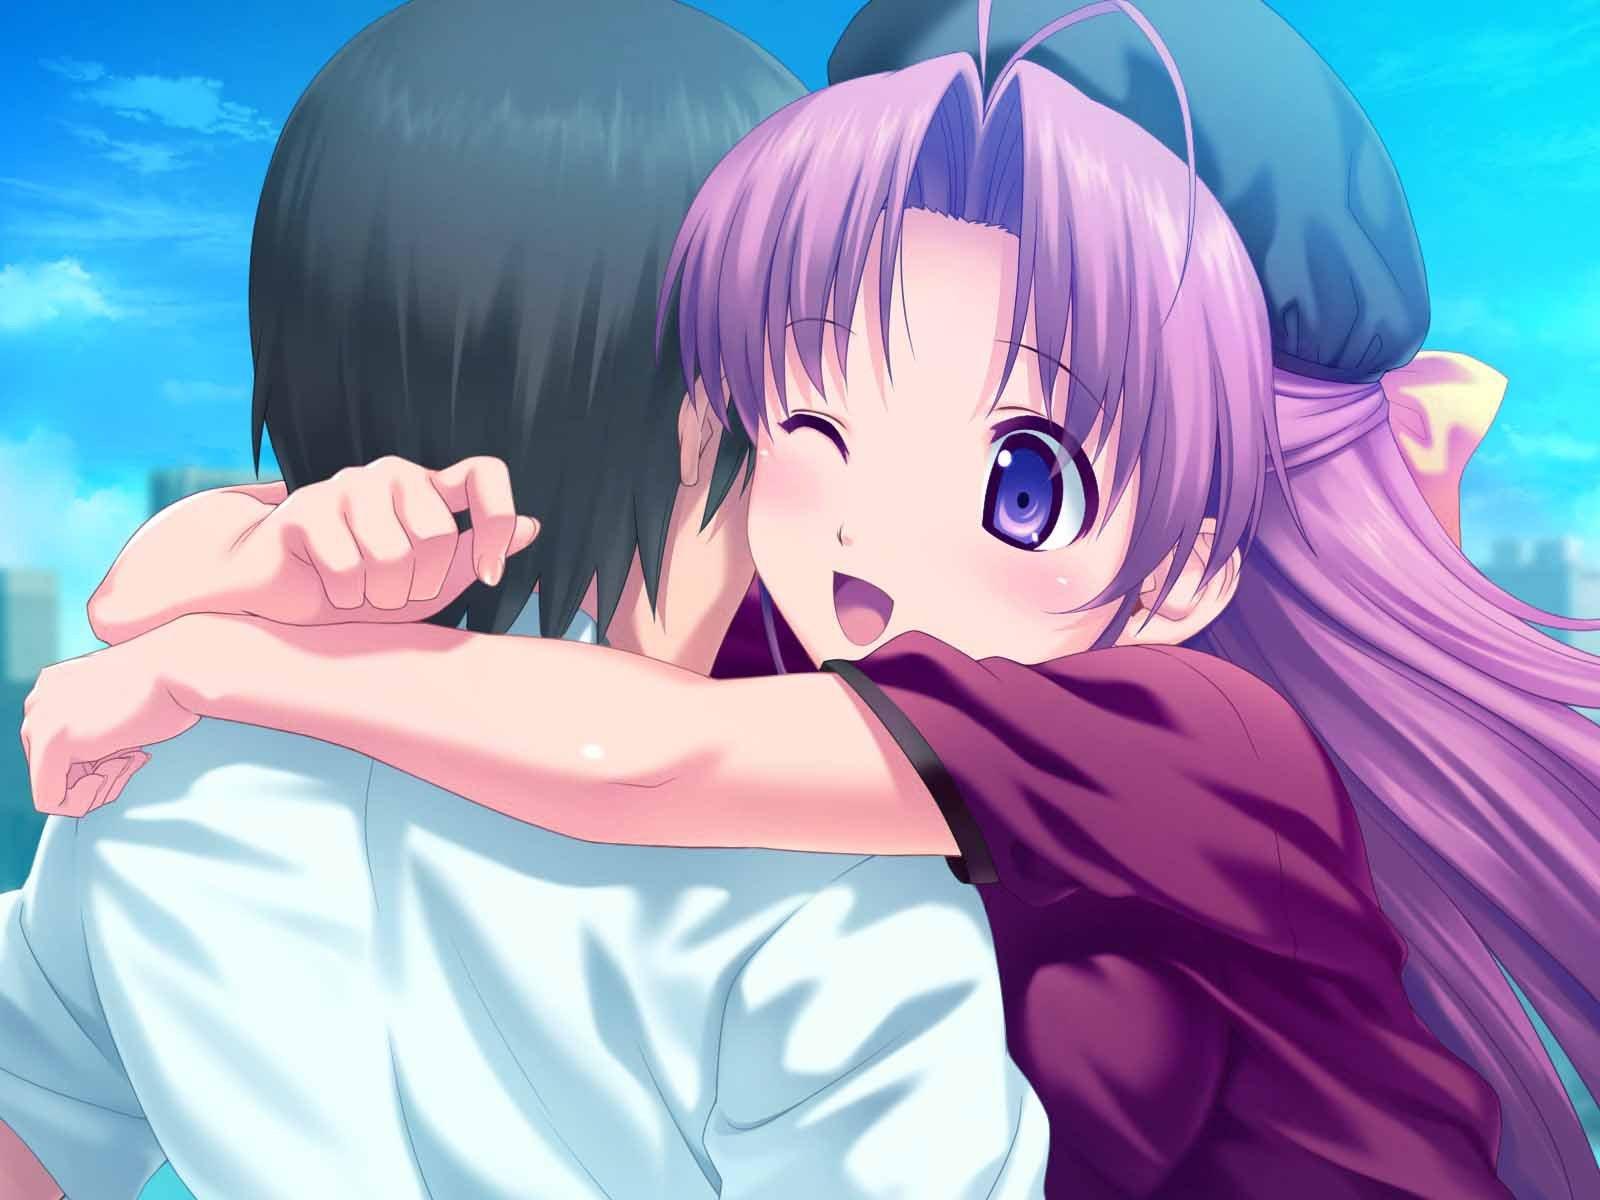 Love Hug Wallpaper Hd : Hug hugging couple love mood people men women happy original anime fantasy wallpaper 1600x1200 ...